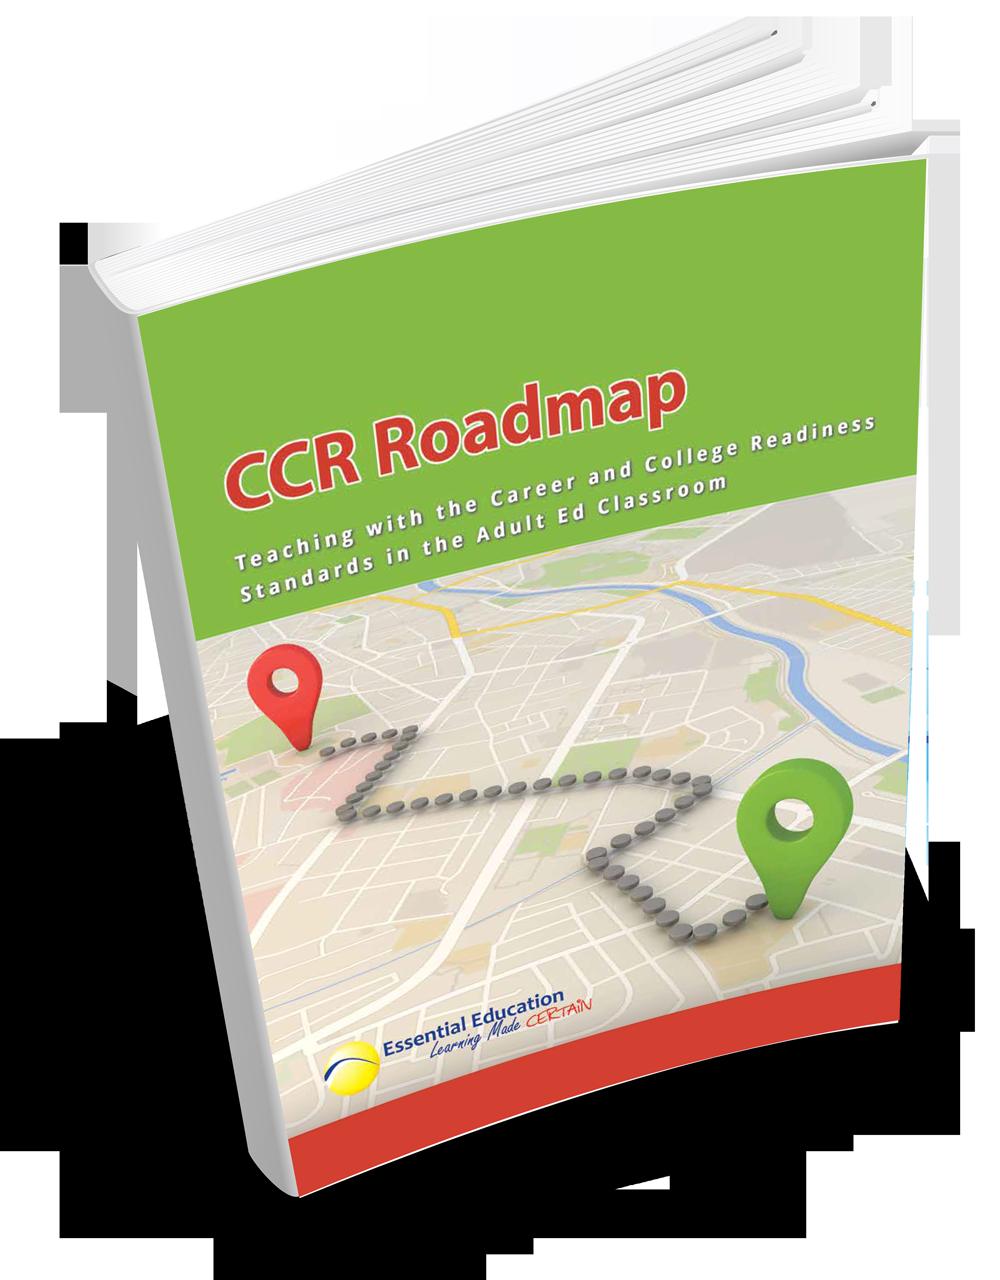 CCR Roadmap